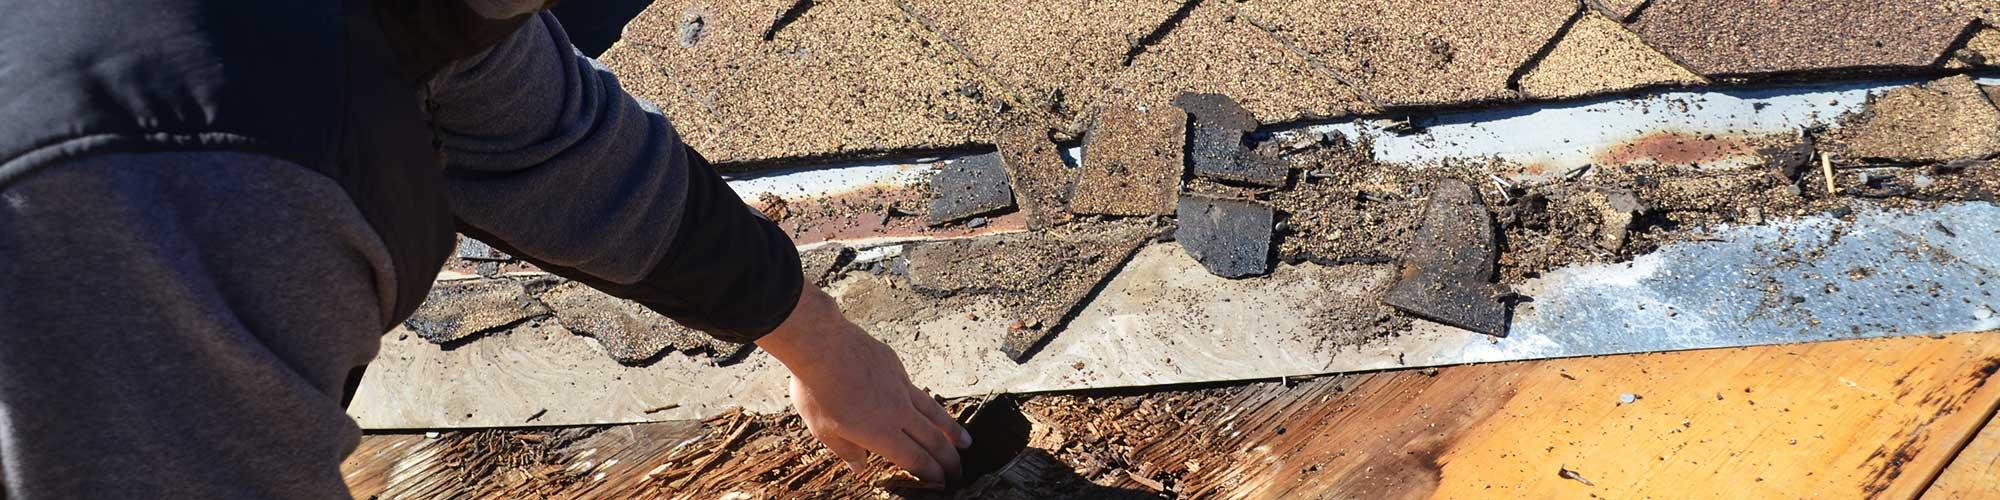 Calgary Elite Roofing Repair Services